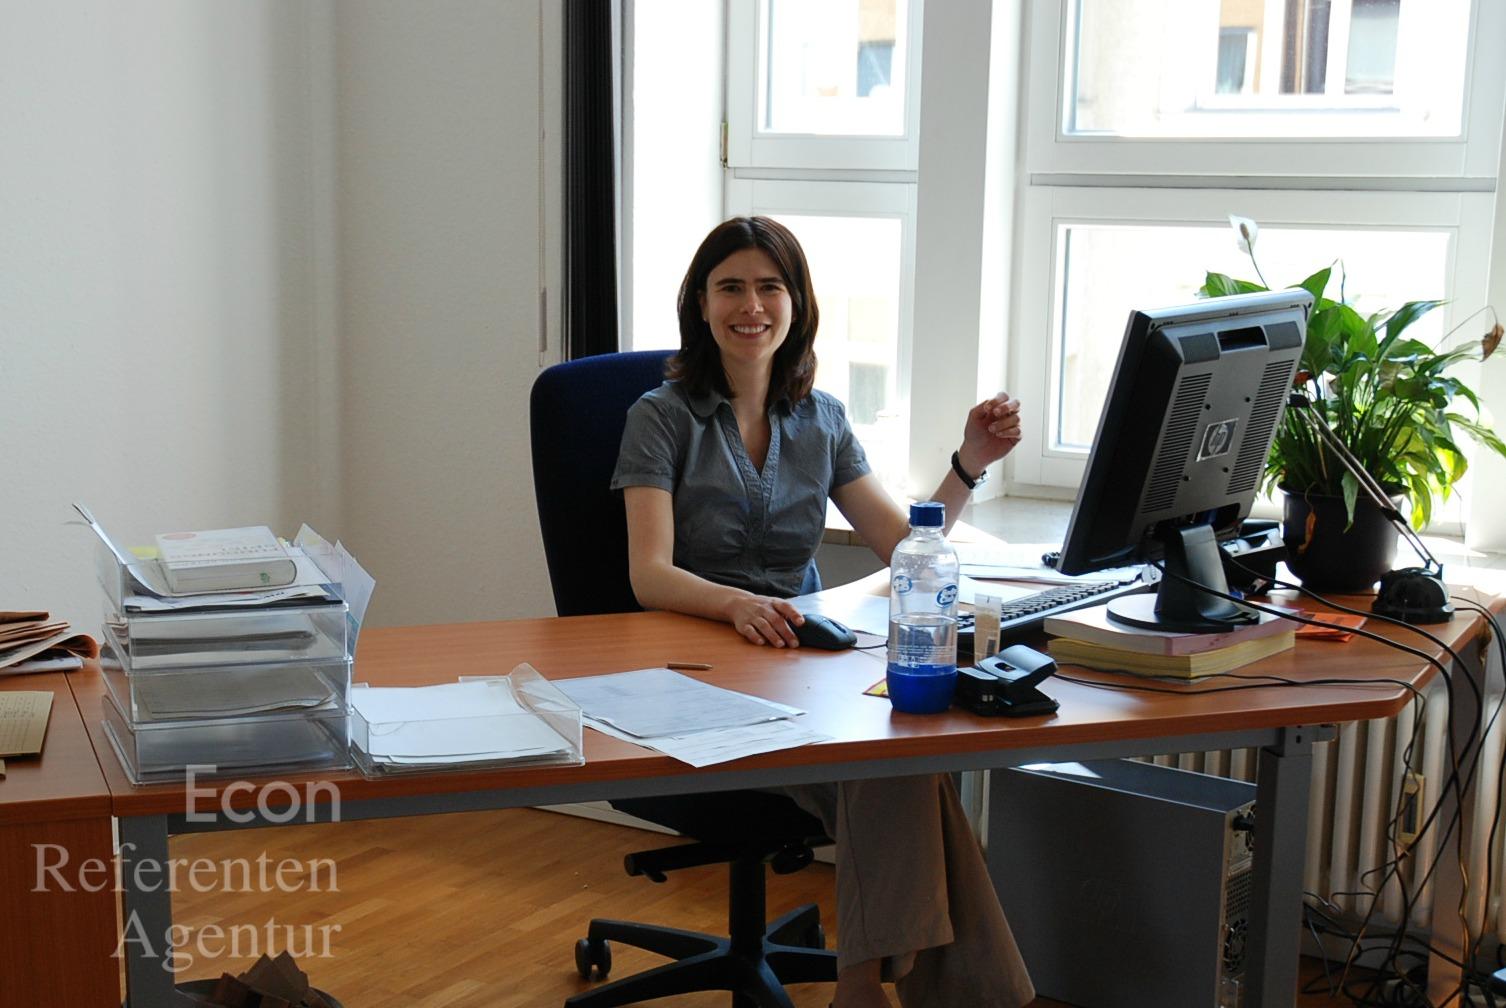 econ referenten agentur_Marion Gissing